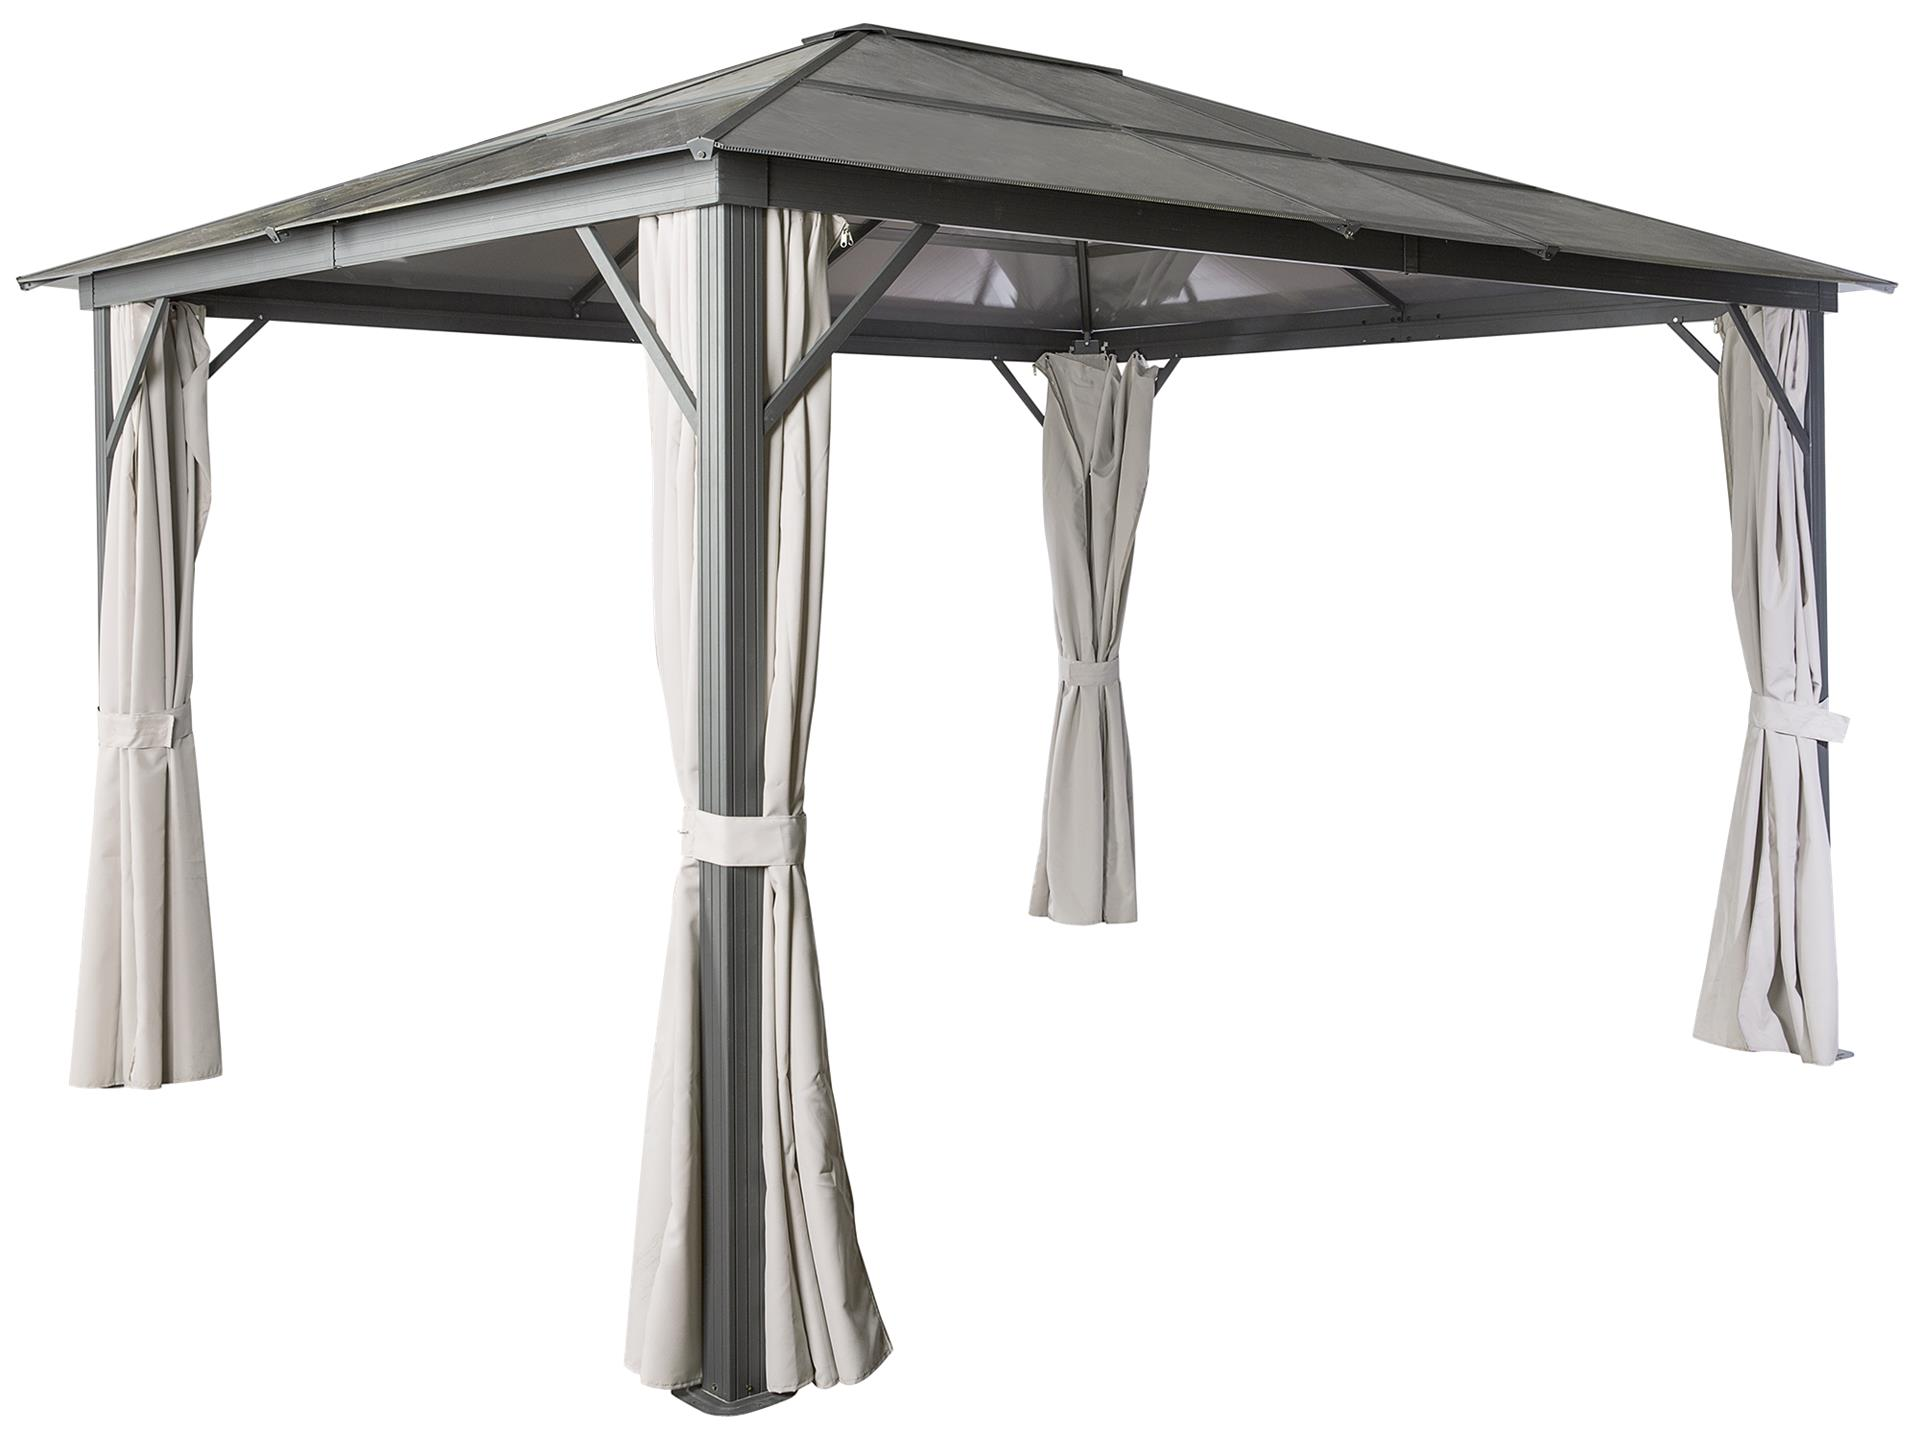 Pergola De Aluminio Viveiro 3x3 65x2 6m Leroy Merlin Portugal